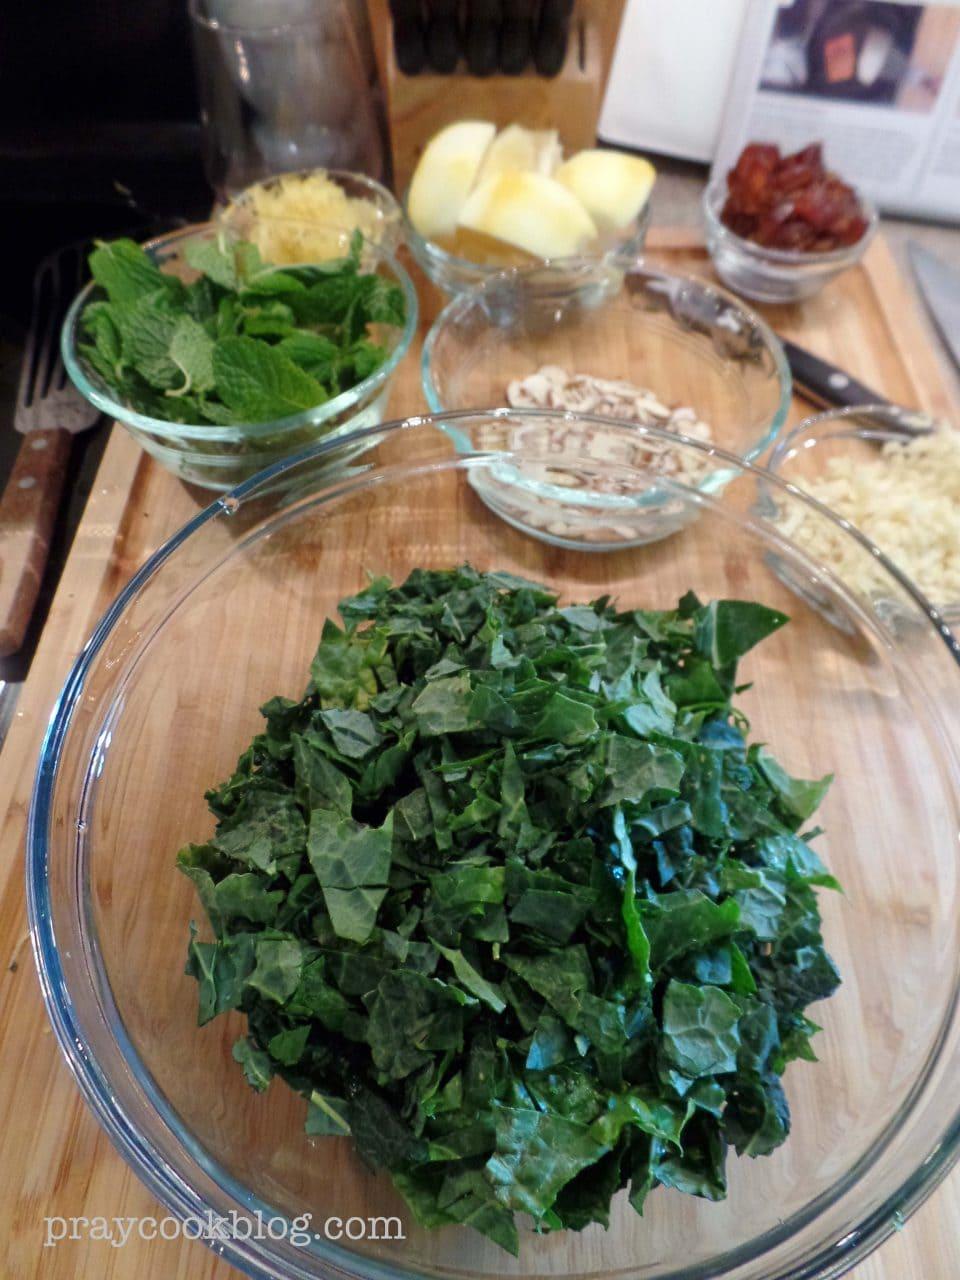 Blue apron salmon - Fresh Ingredients Ready To Cook